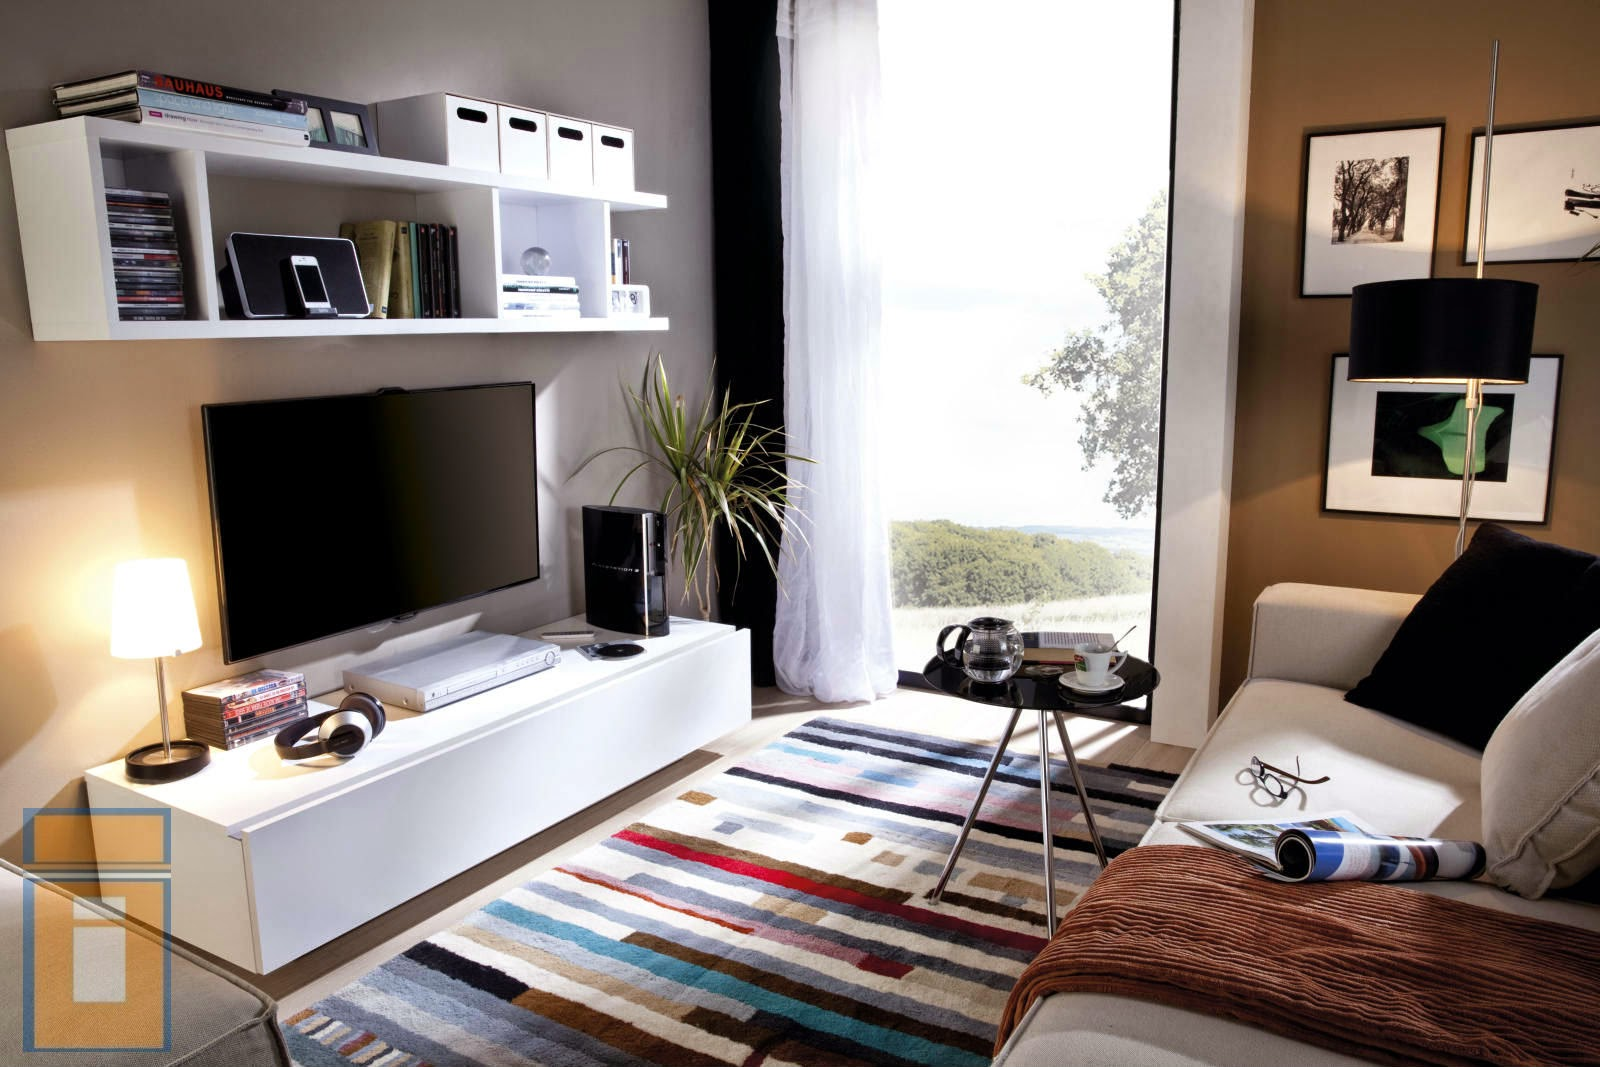 Armimobel muebles con vida comedores modulares hazlo - Muebles de salon para pequenos espacios ...